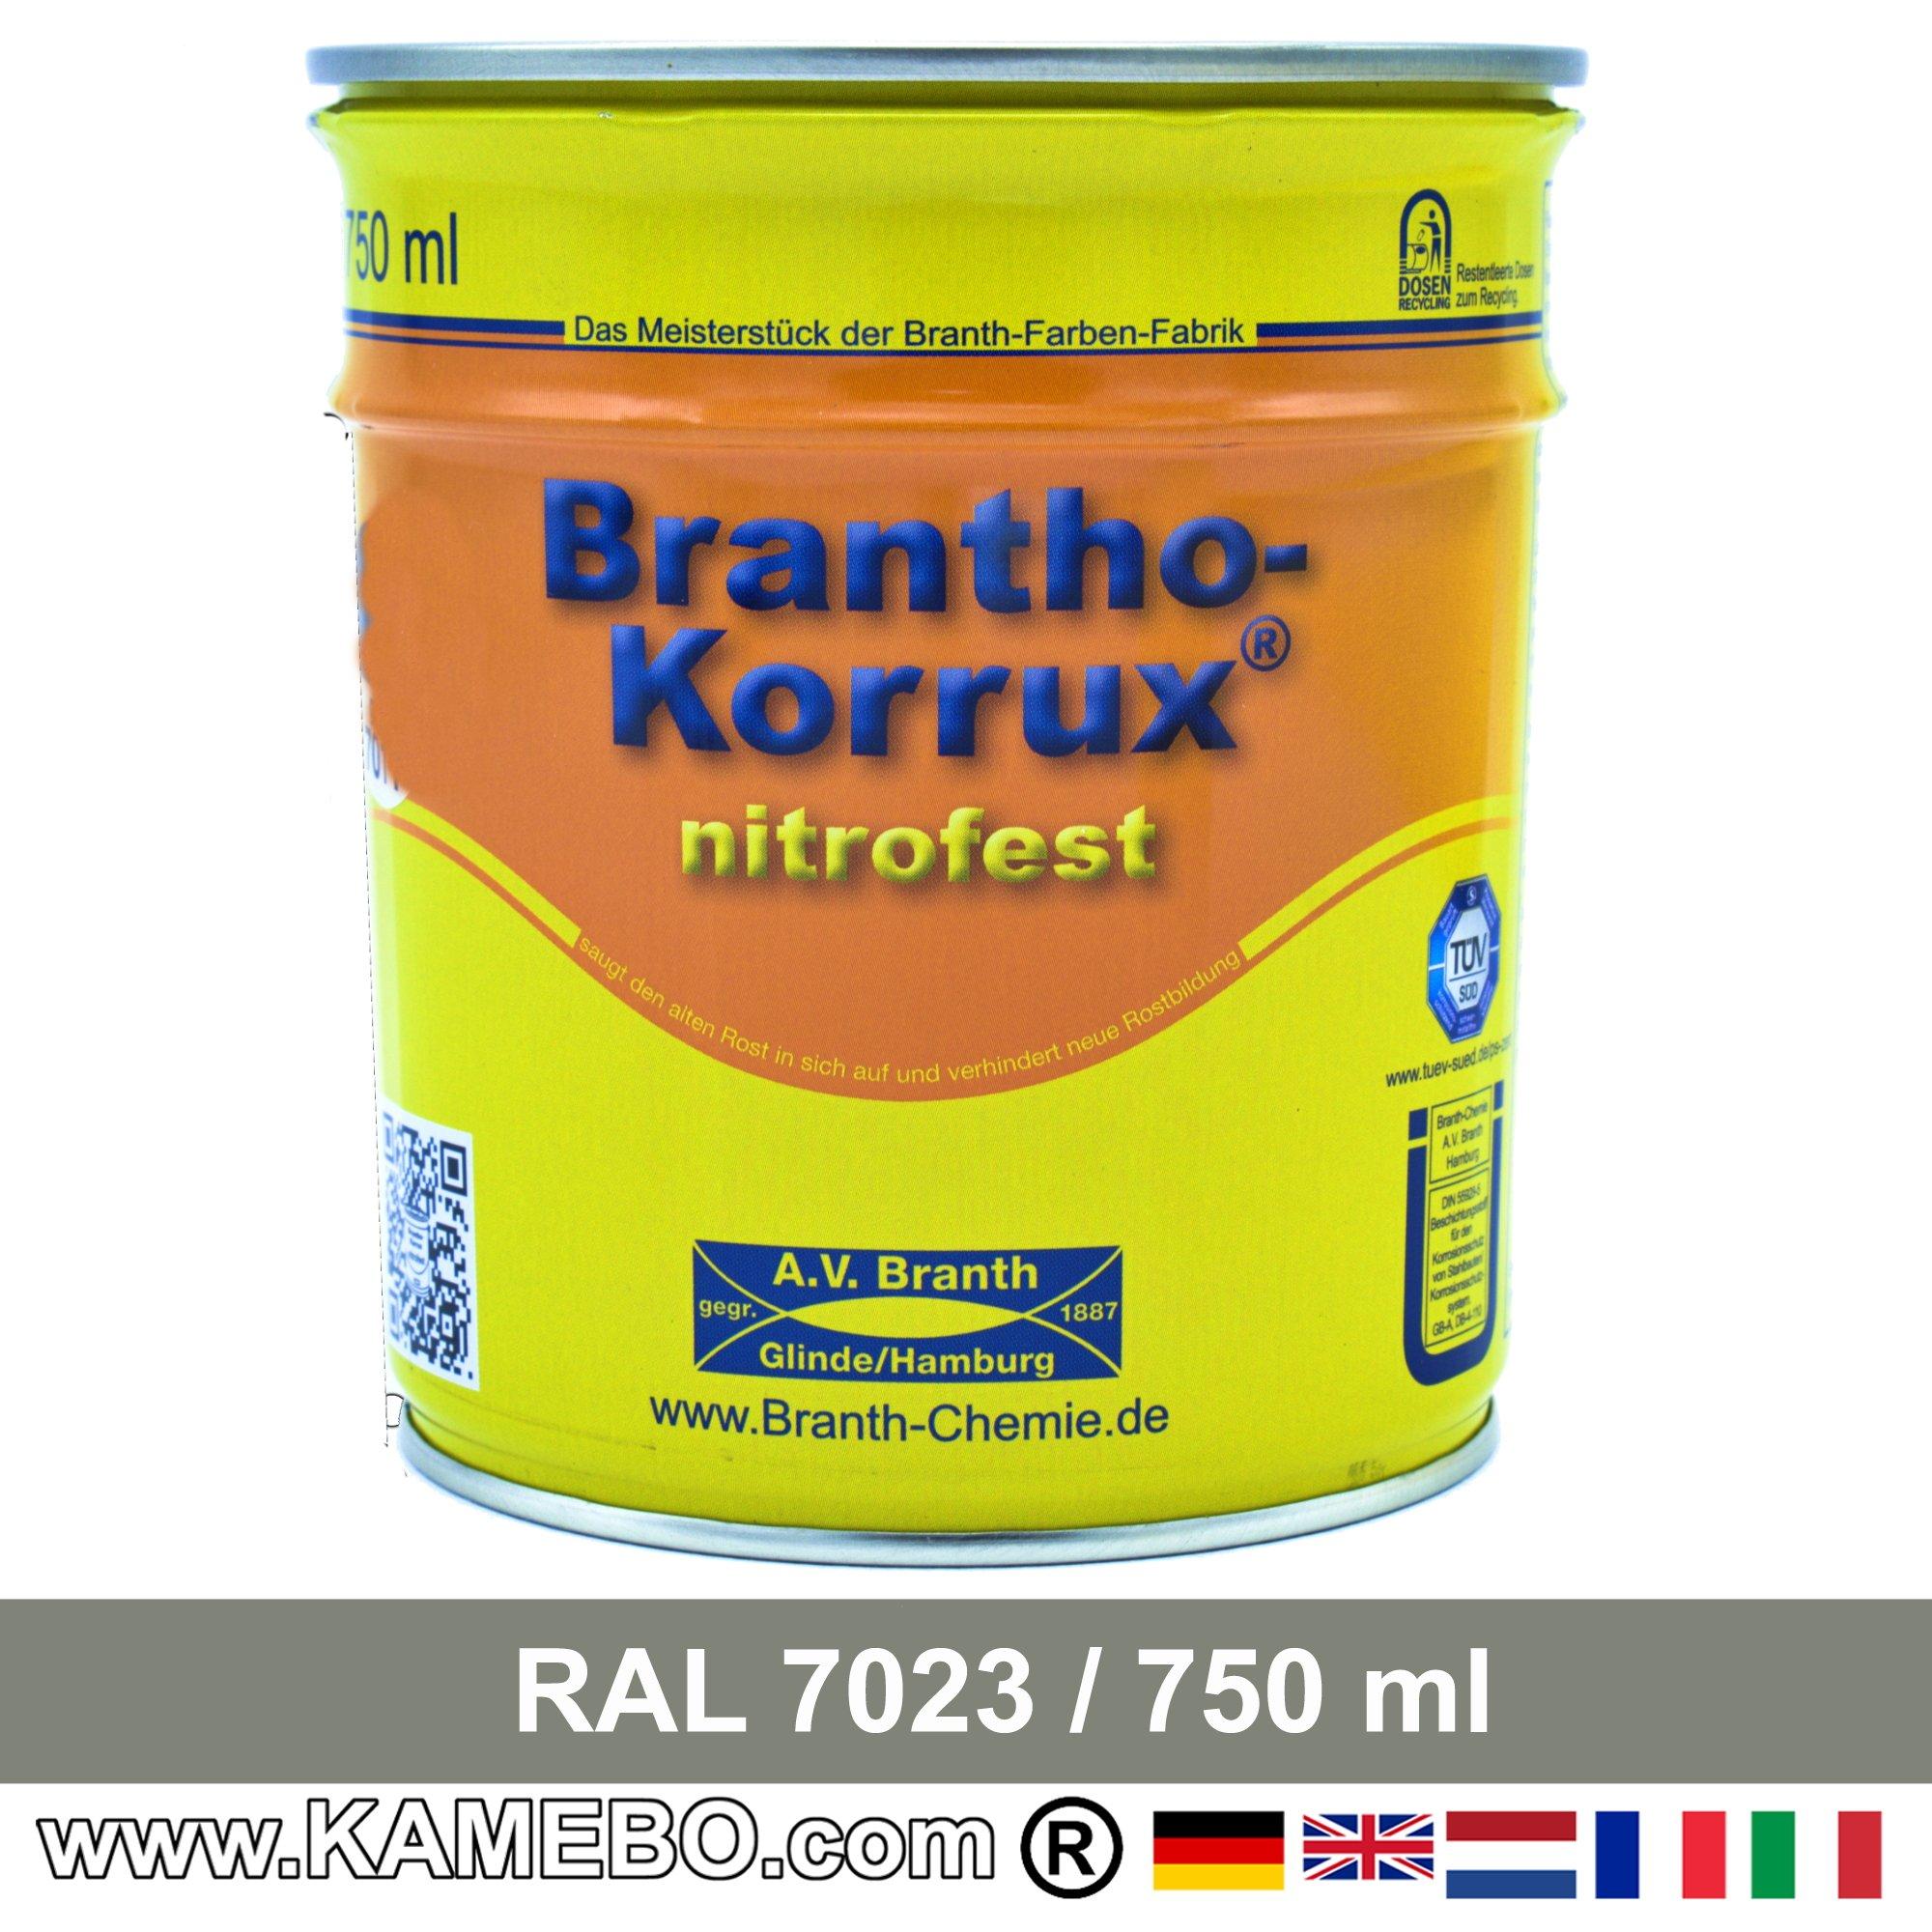 brantho korrux nitrofest korrosionsschutzlack ral 7023 betongrau 750 ml. Black Bedroom Furniture Sets. Home Design Ideas